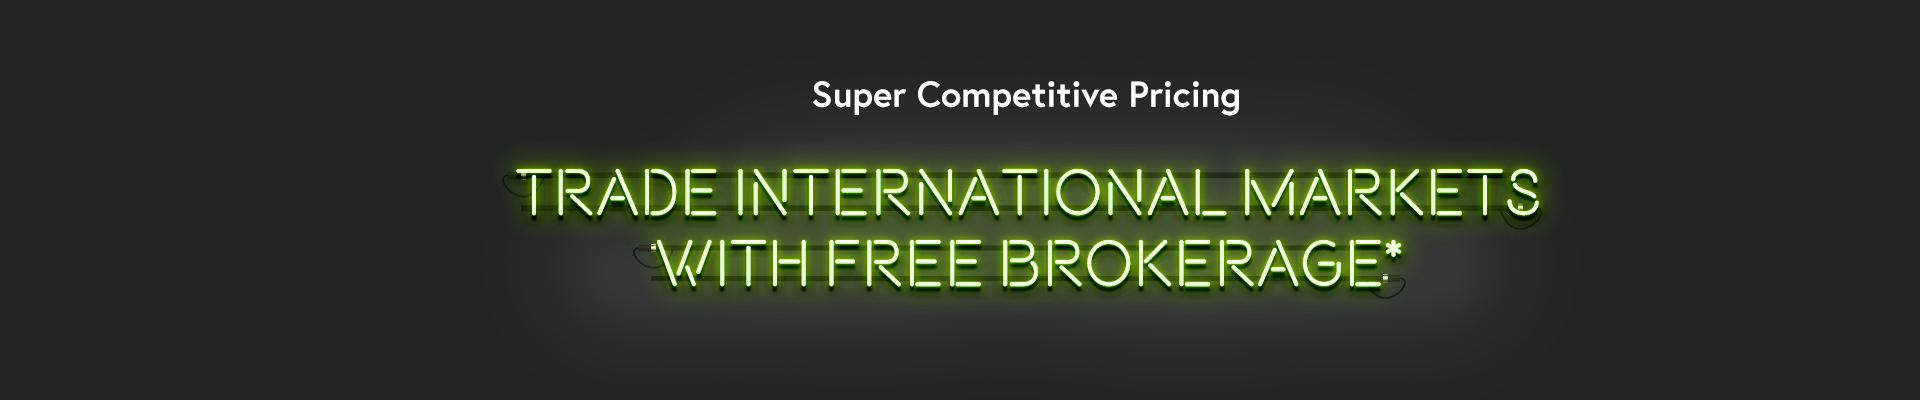 Free stock brokerage offer in neon lights